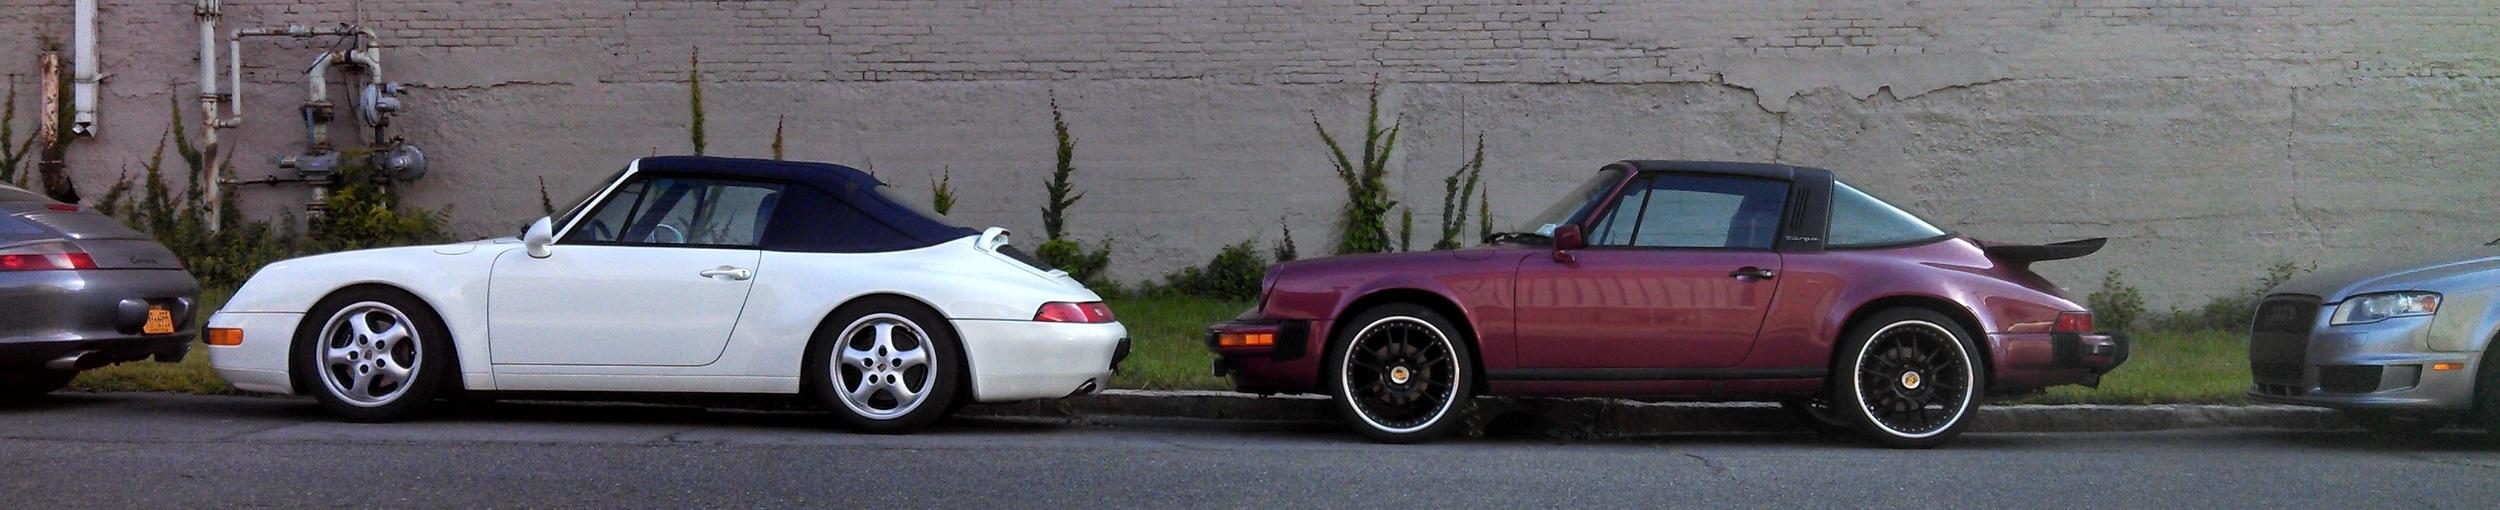 993 cab and targa cropped.jpg